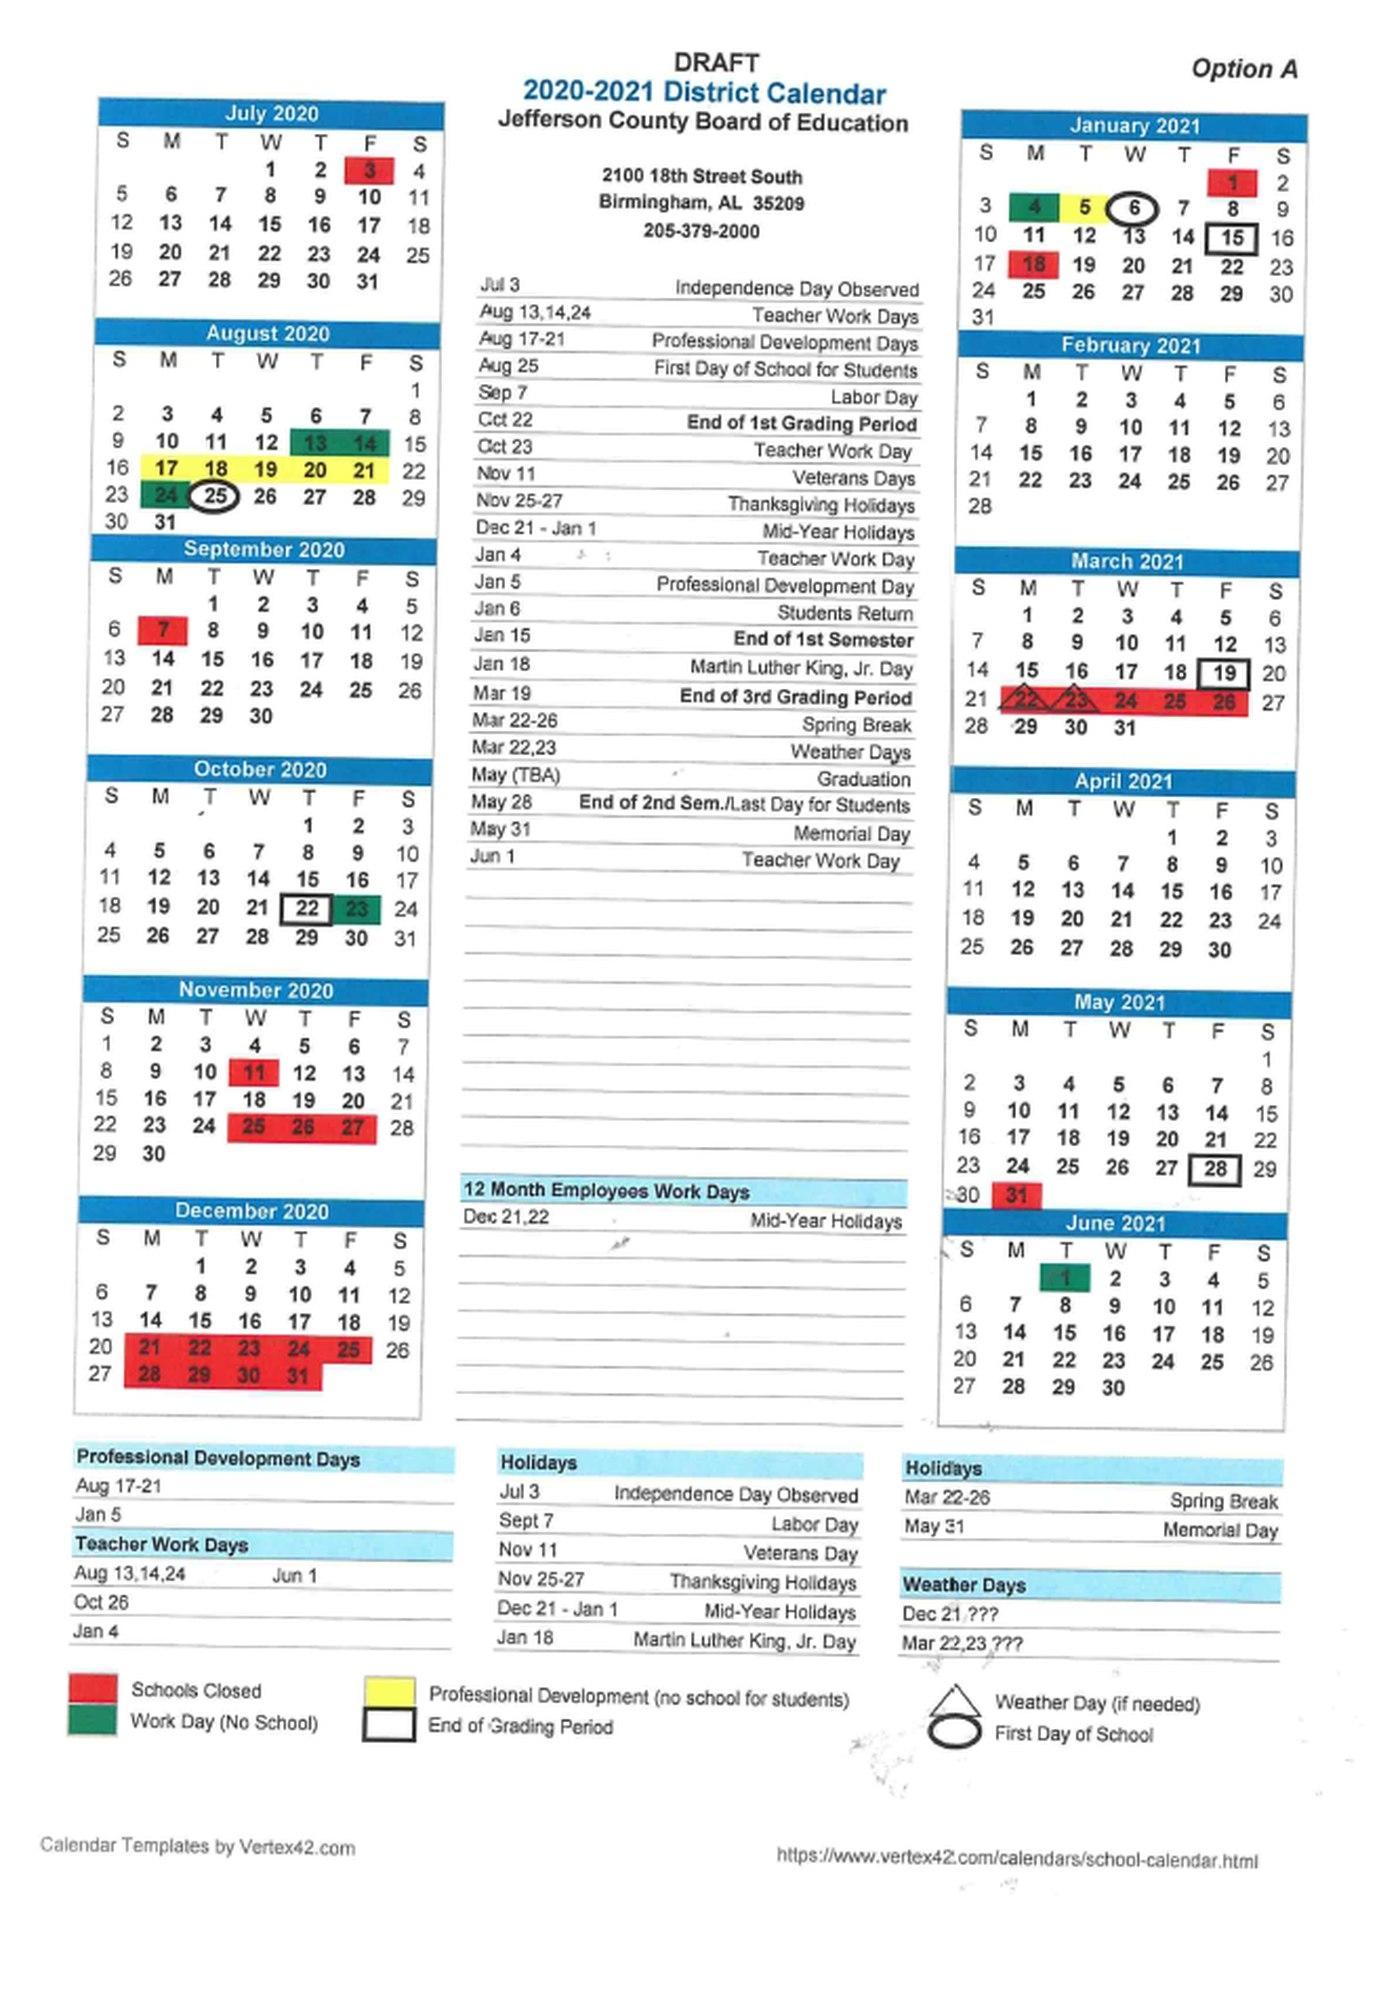 Jefferson County School Calendar.Incredible School Calendar Jefferson County Alabama Printable